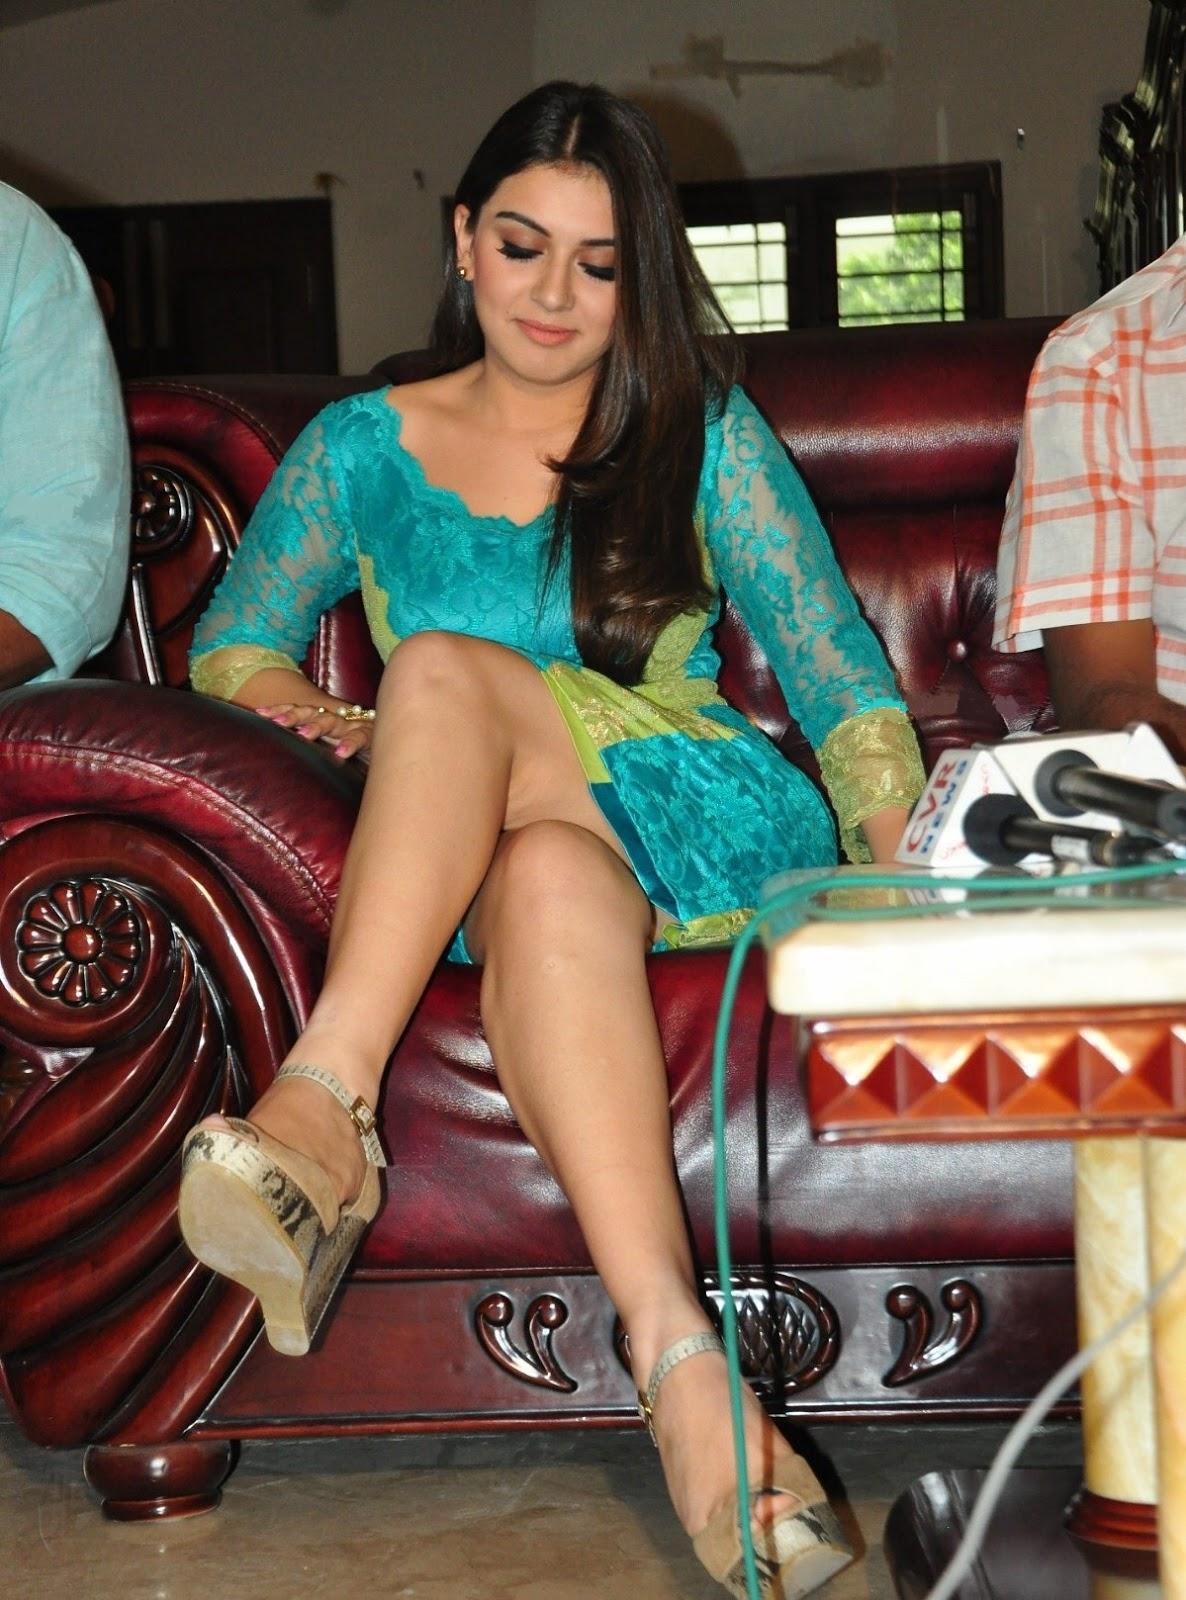 Glamours Tamil Actress Hansika Motwani Milky White Thigh Show In Short Green Dress